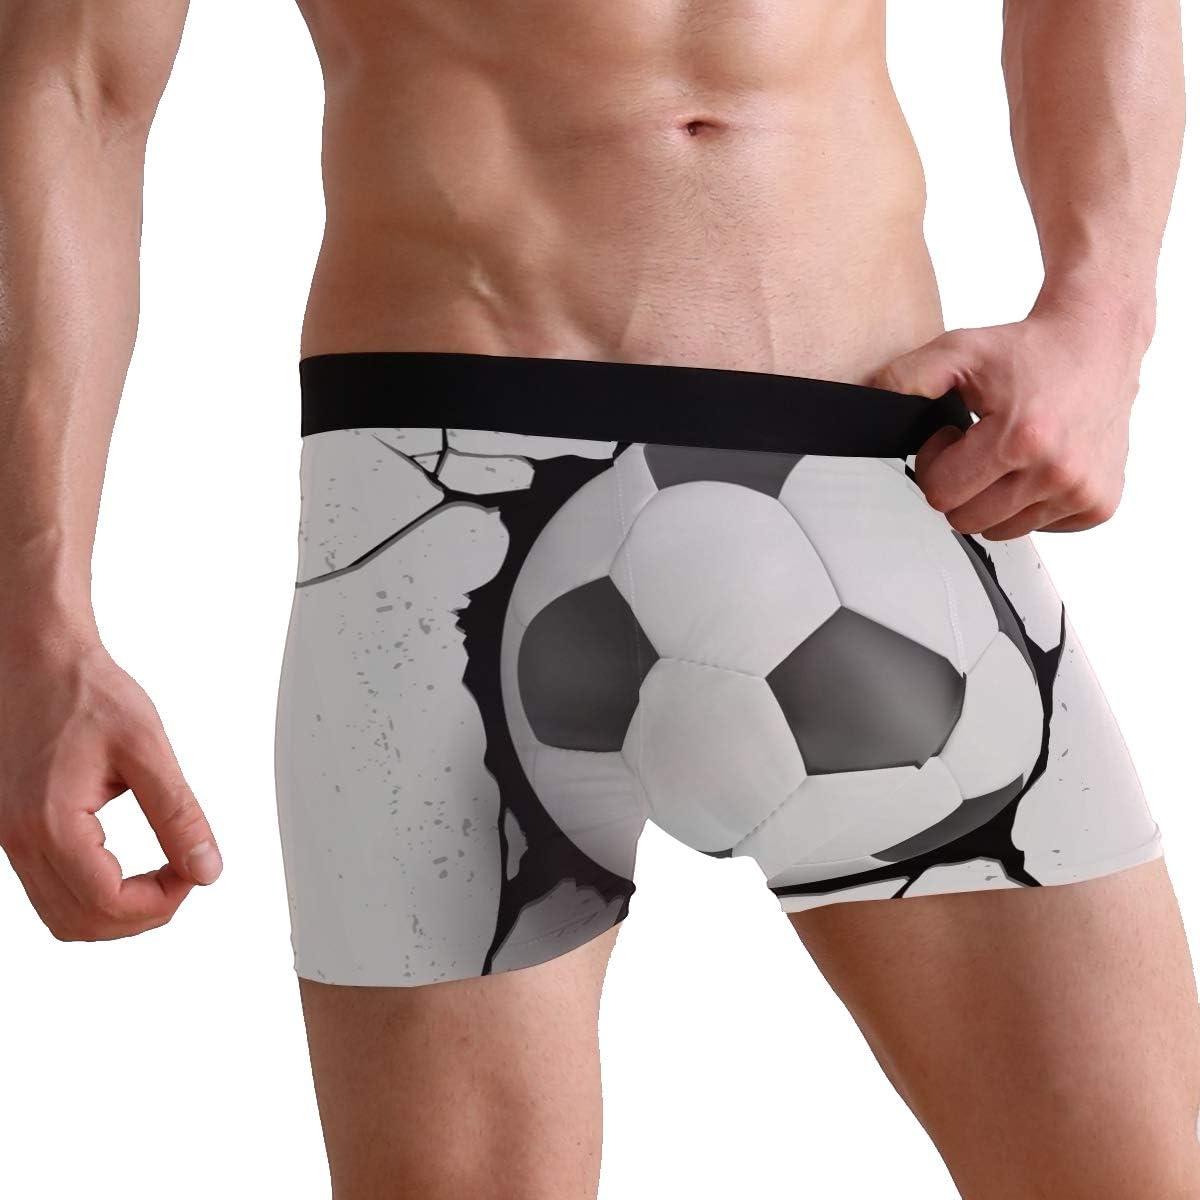 MOFEIYUE Mens Boxer Briefs Sport Soccer Ball Soft Short Underpants Underwear for Men Boys